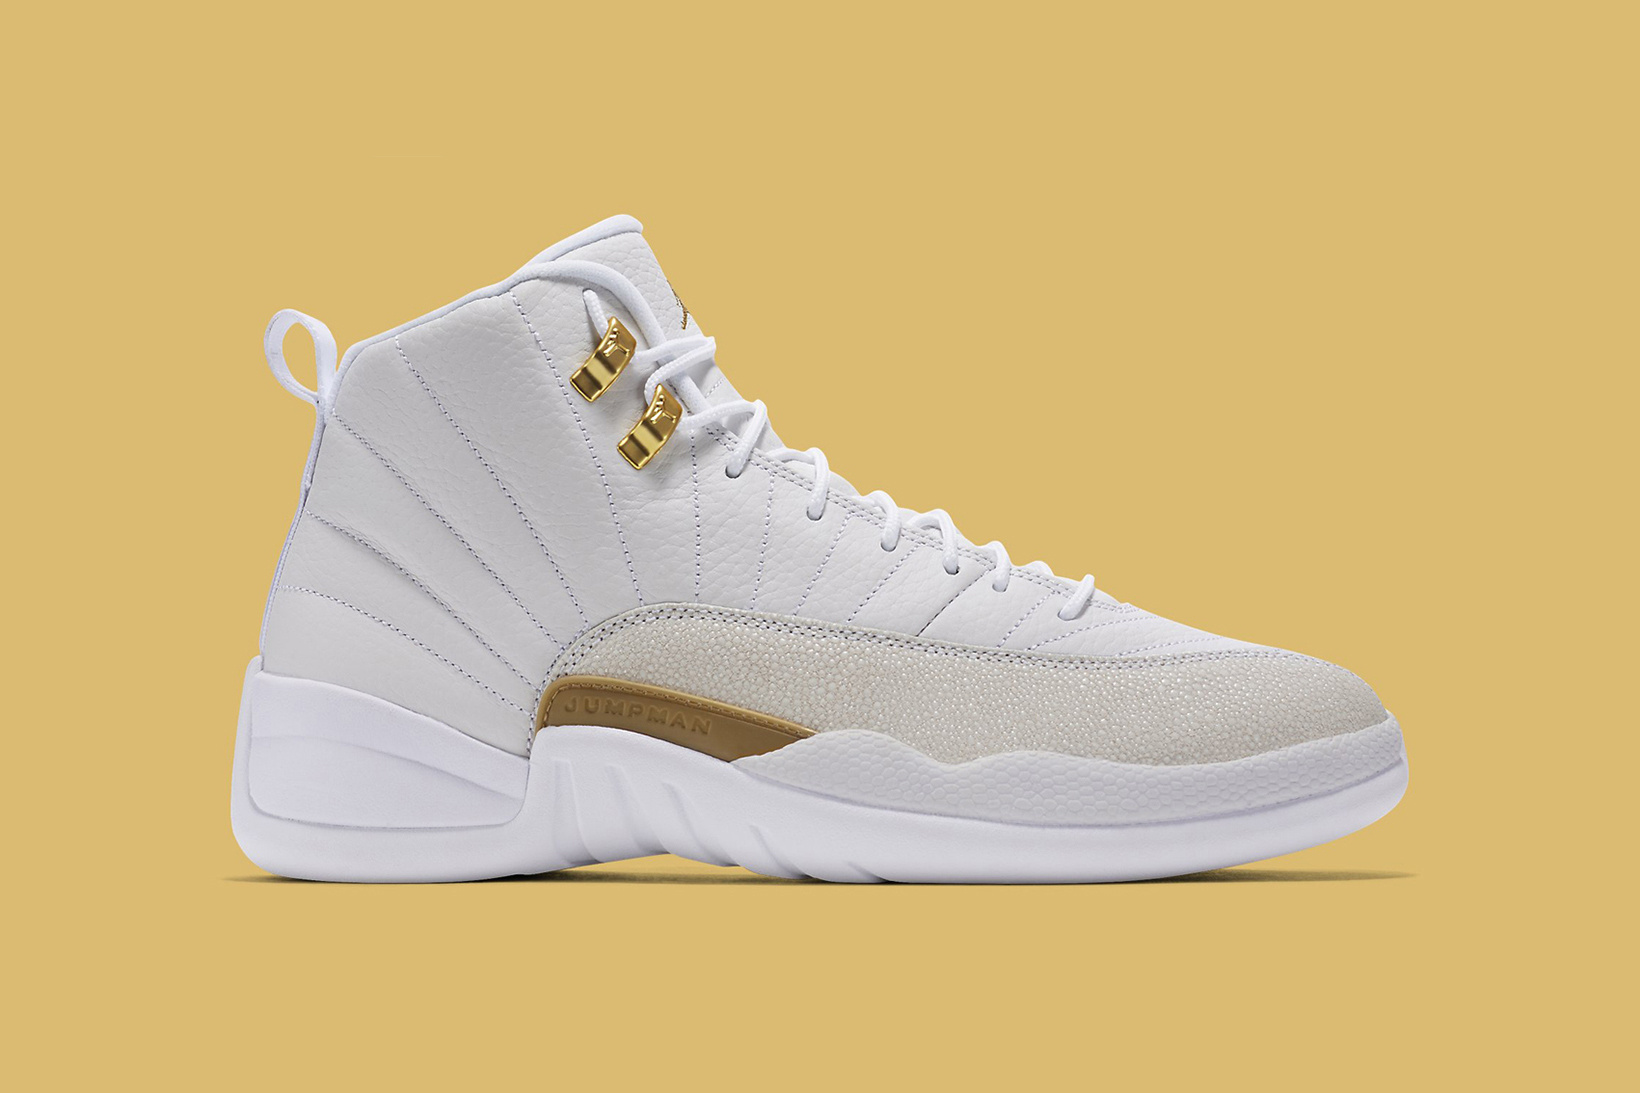 Nike dévoile la «white» Air Jordan 12 en collab' avec OVO